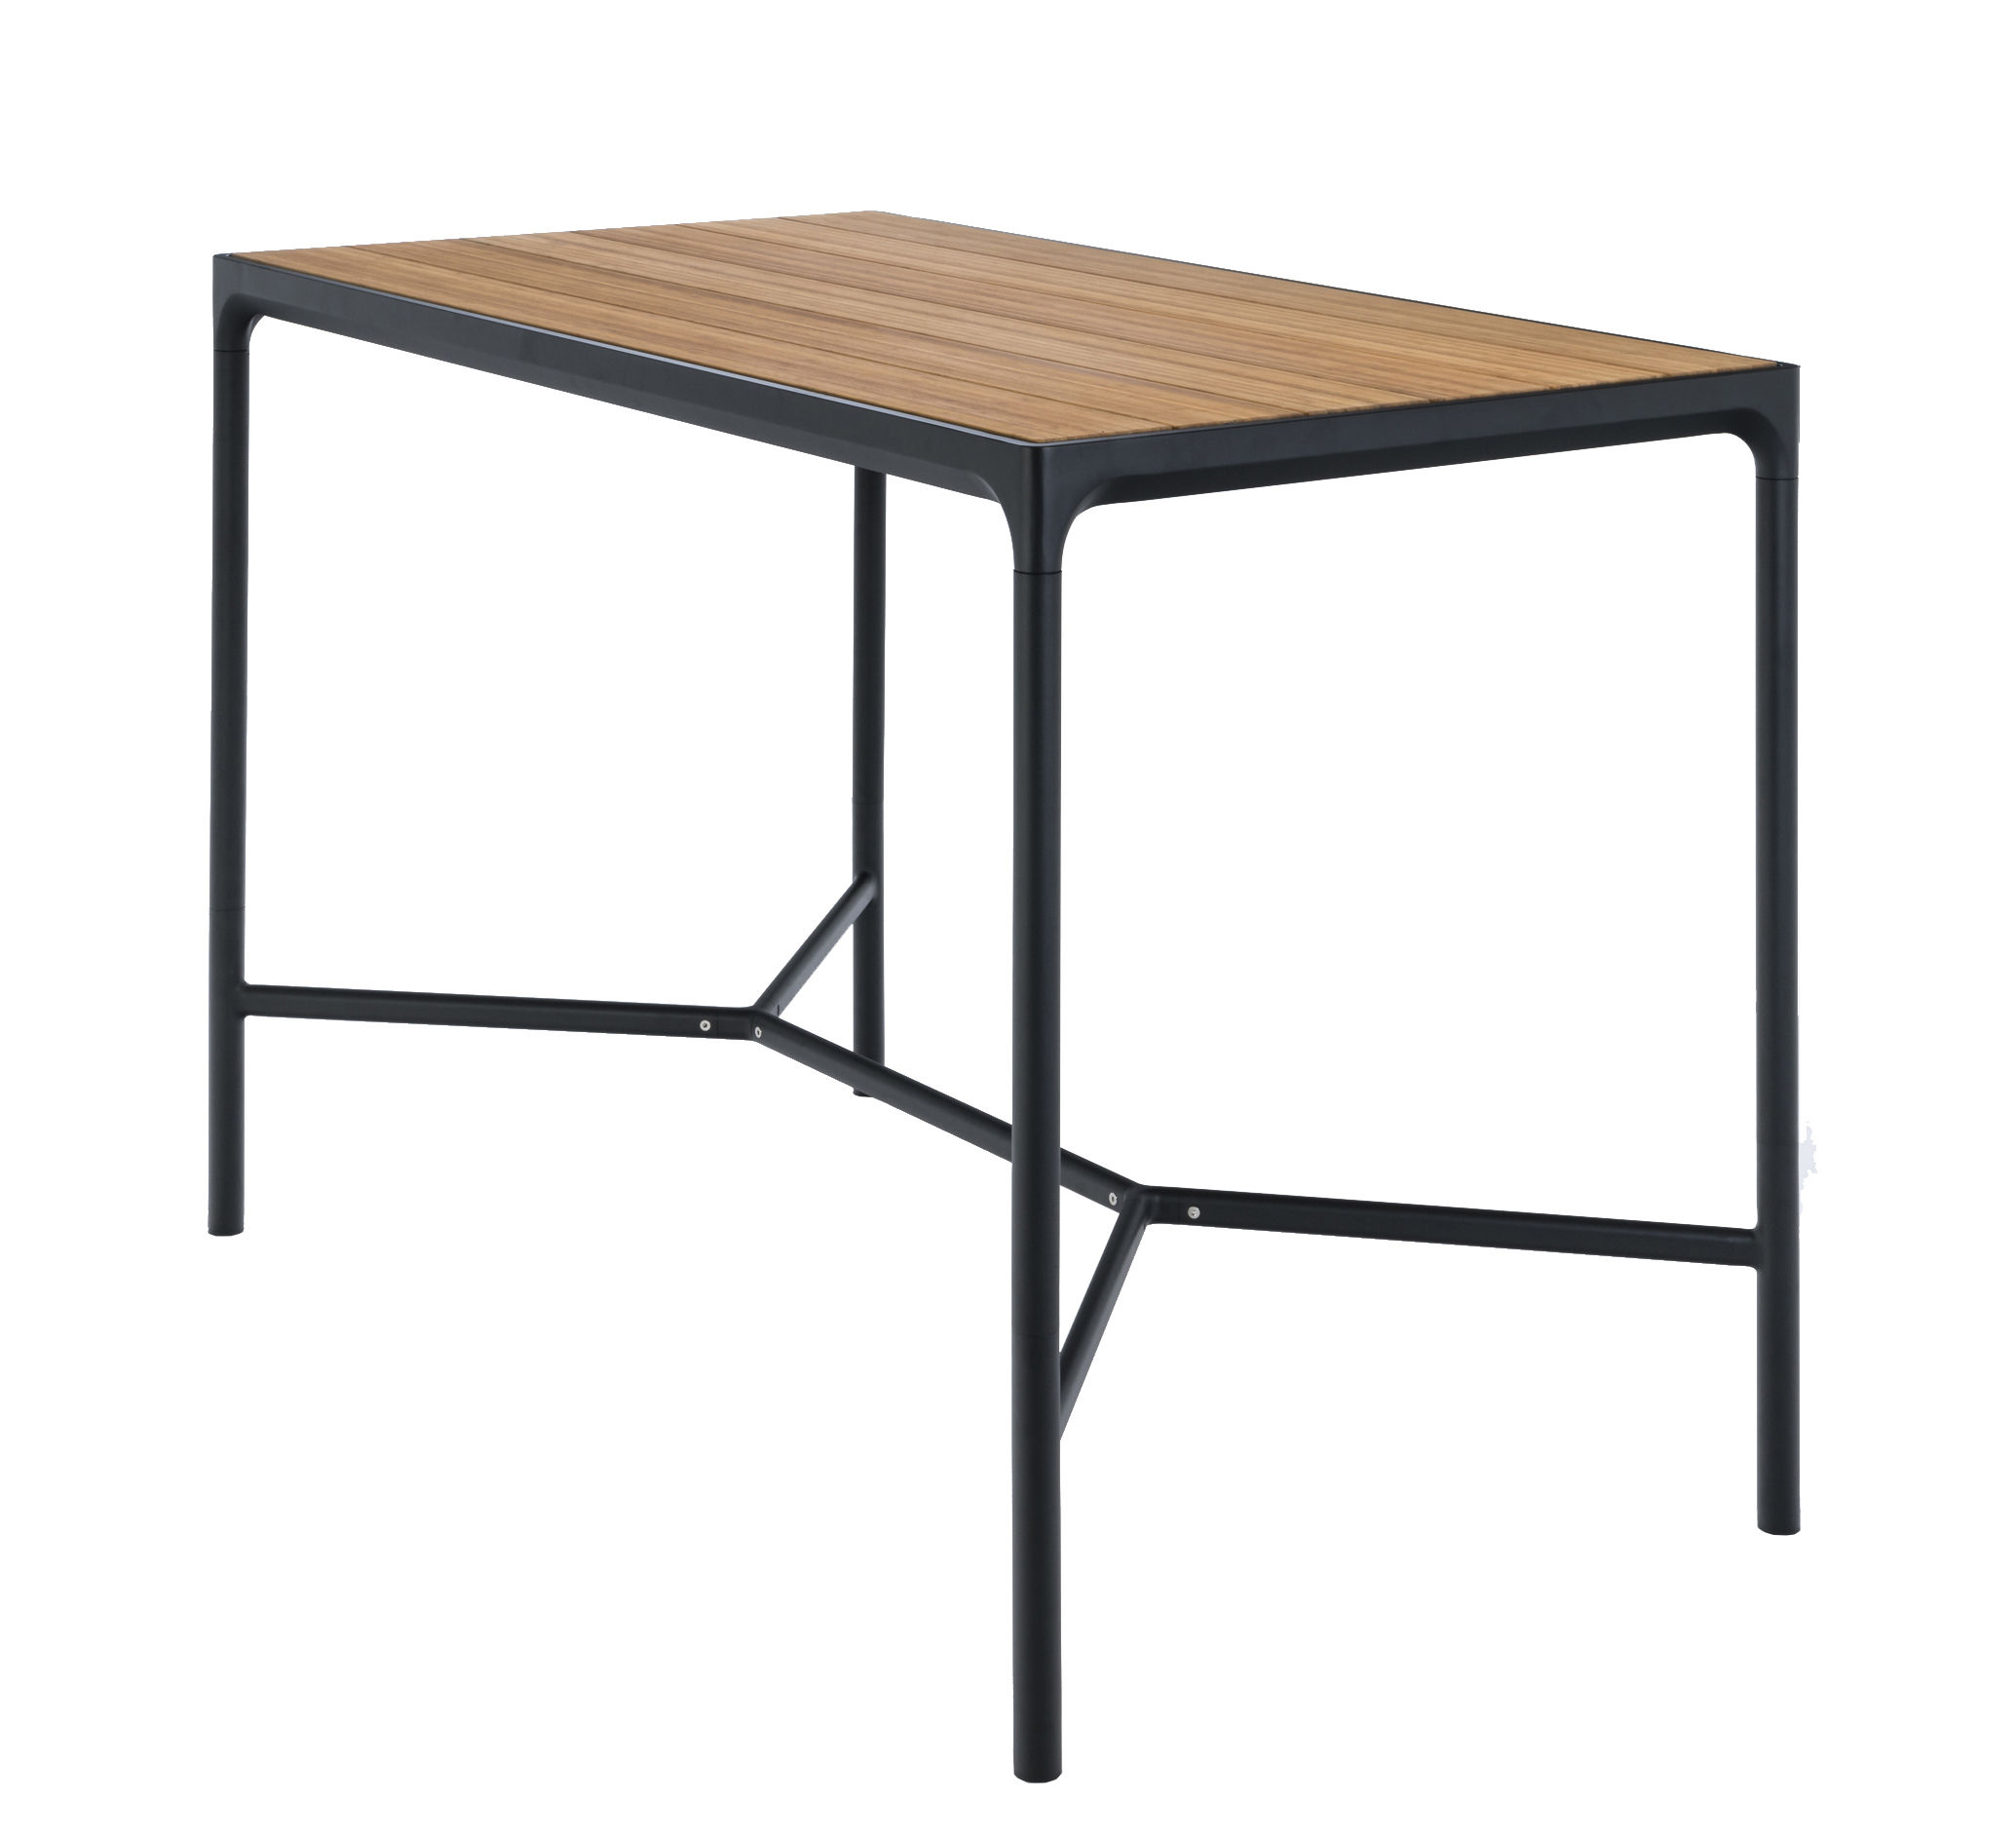 Furniture - High Tables - Four High table - / L 160 x H 111 cm by Houe - Bamboo / Black legs - Aluminium, Bamboo